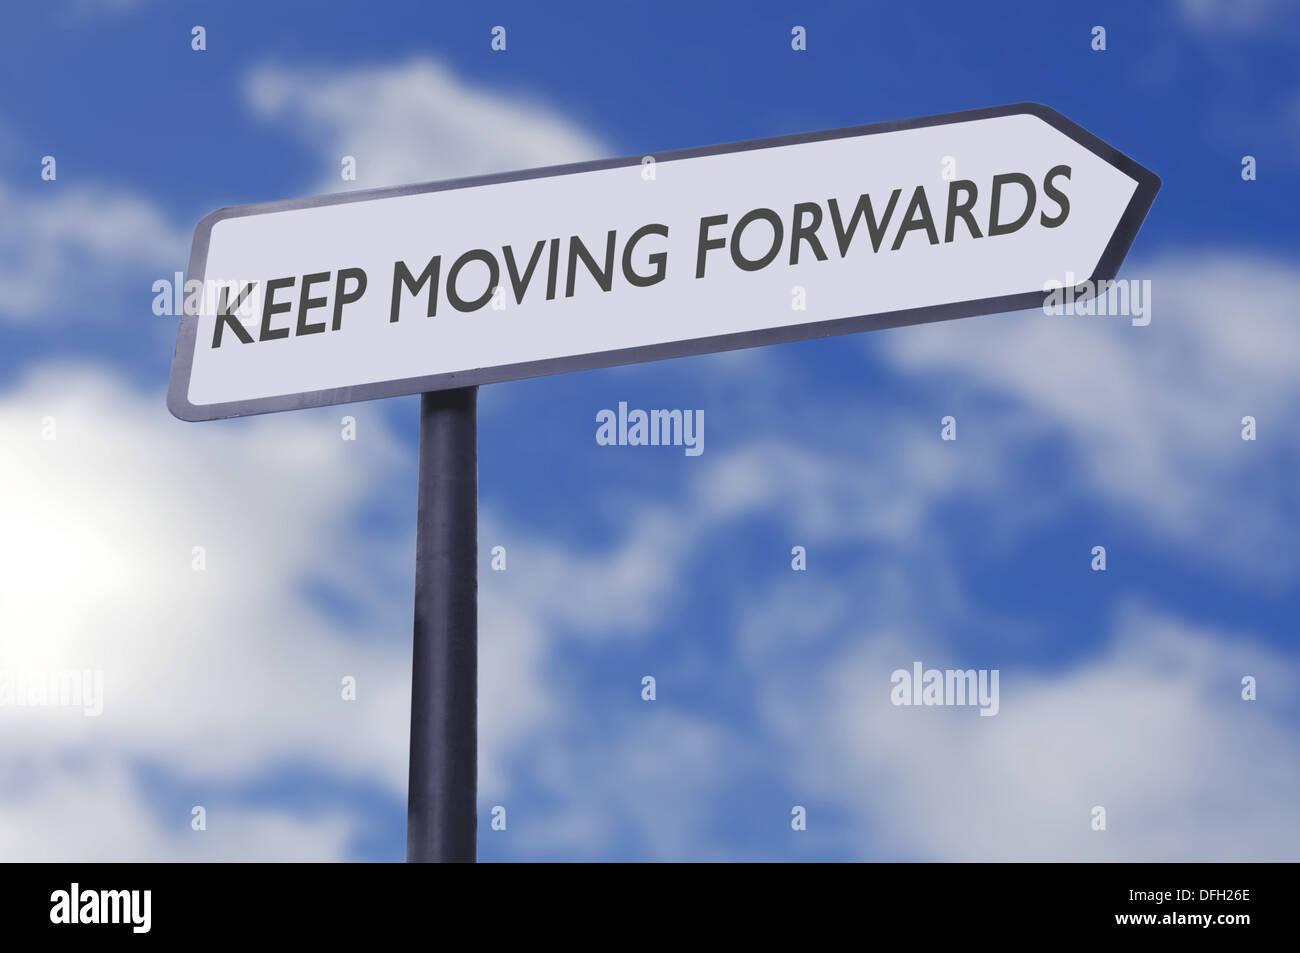 Keep moving motivational street sign - Stock Image